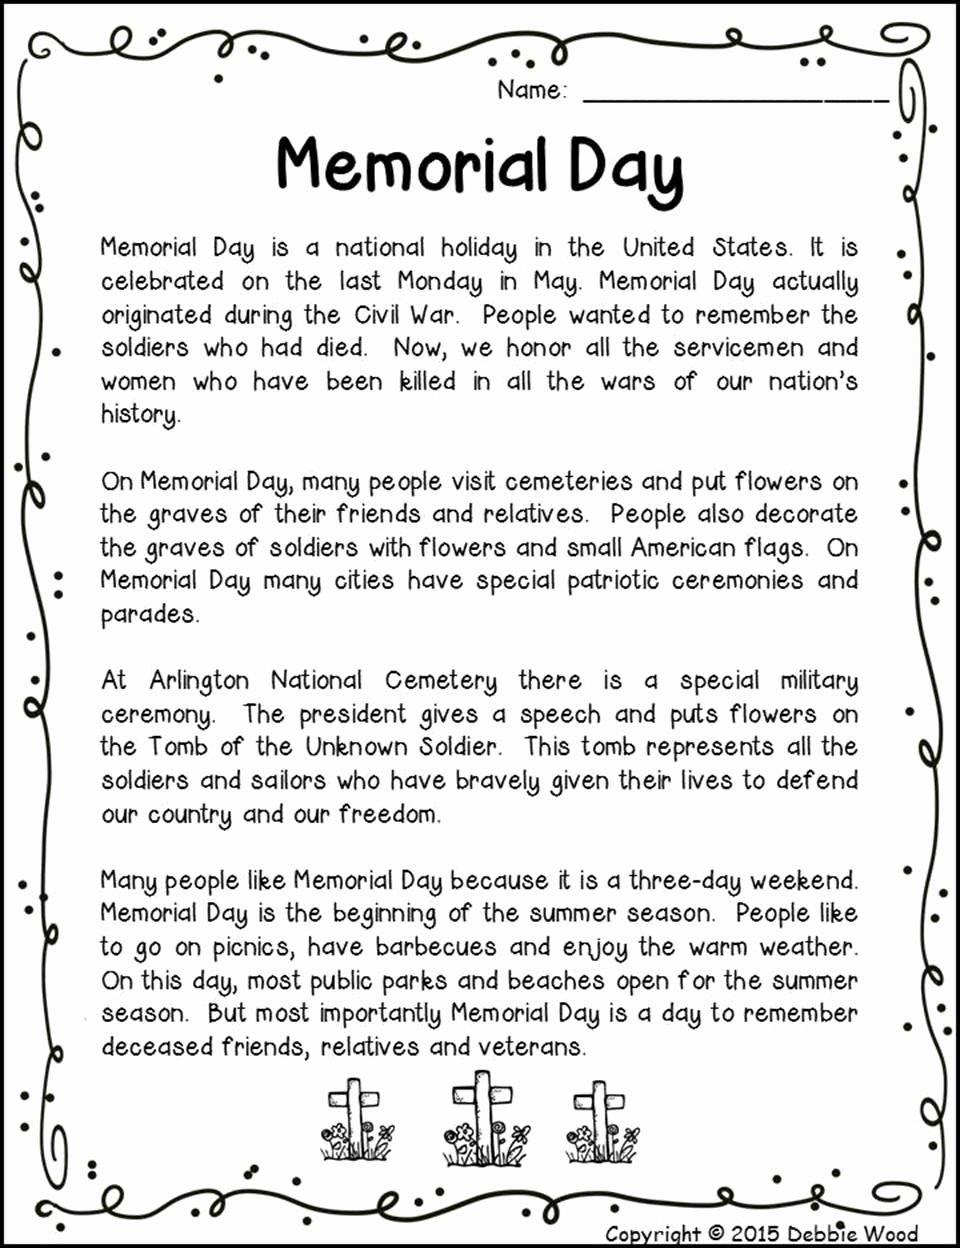 Memorial Day Worksheets for Kids Free Memorial Day